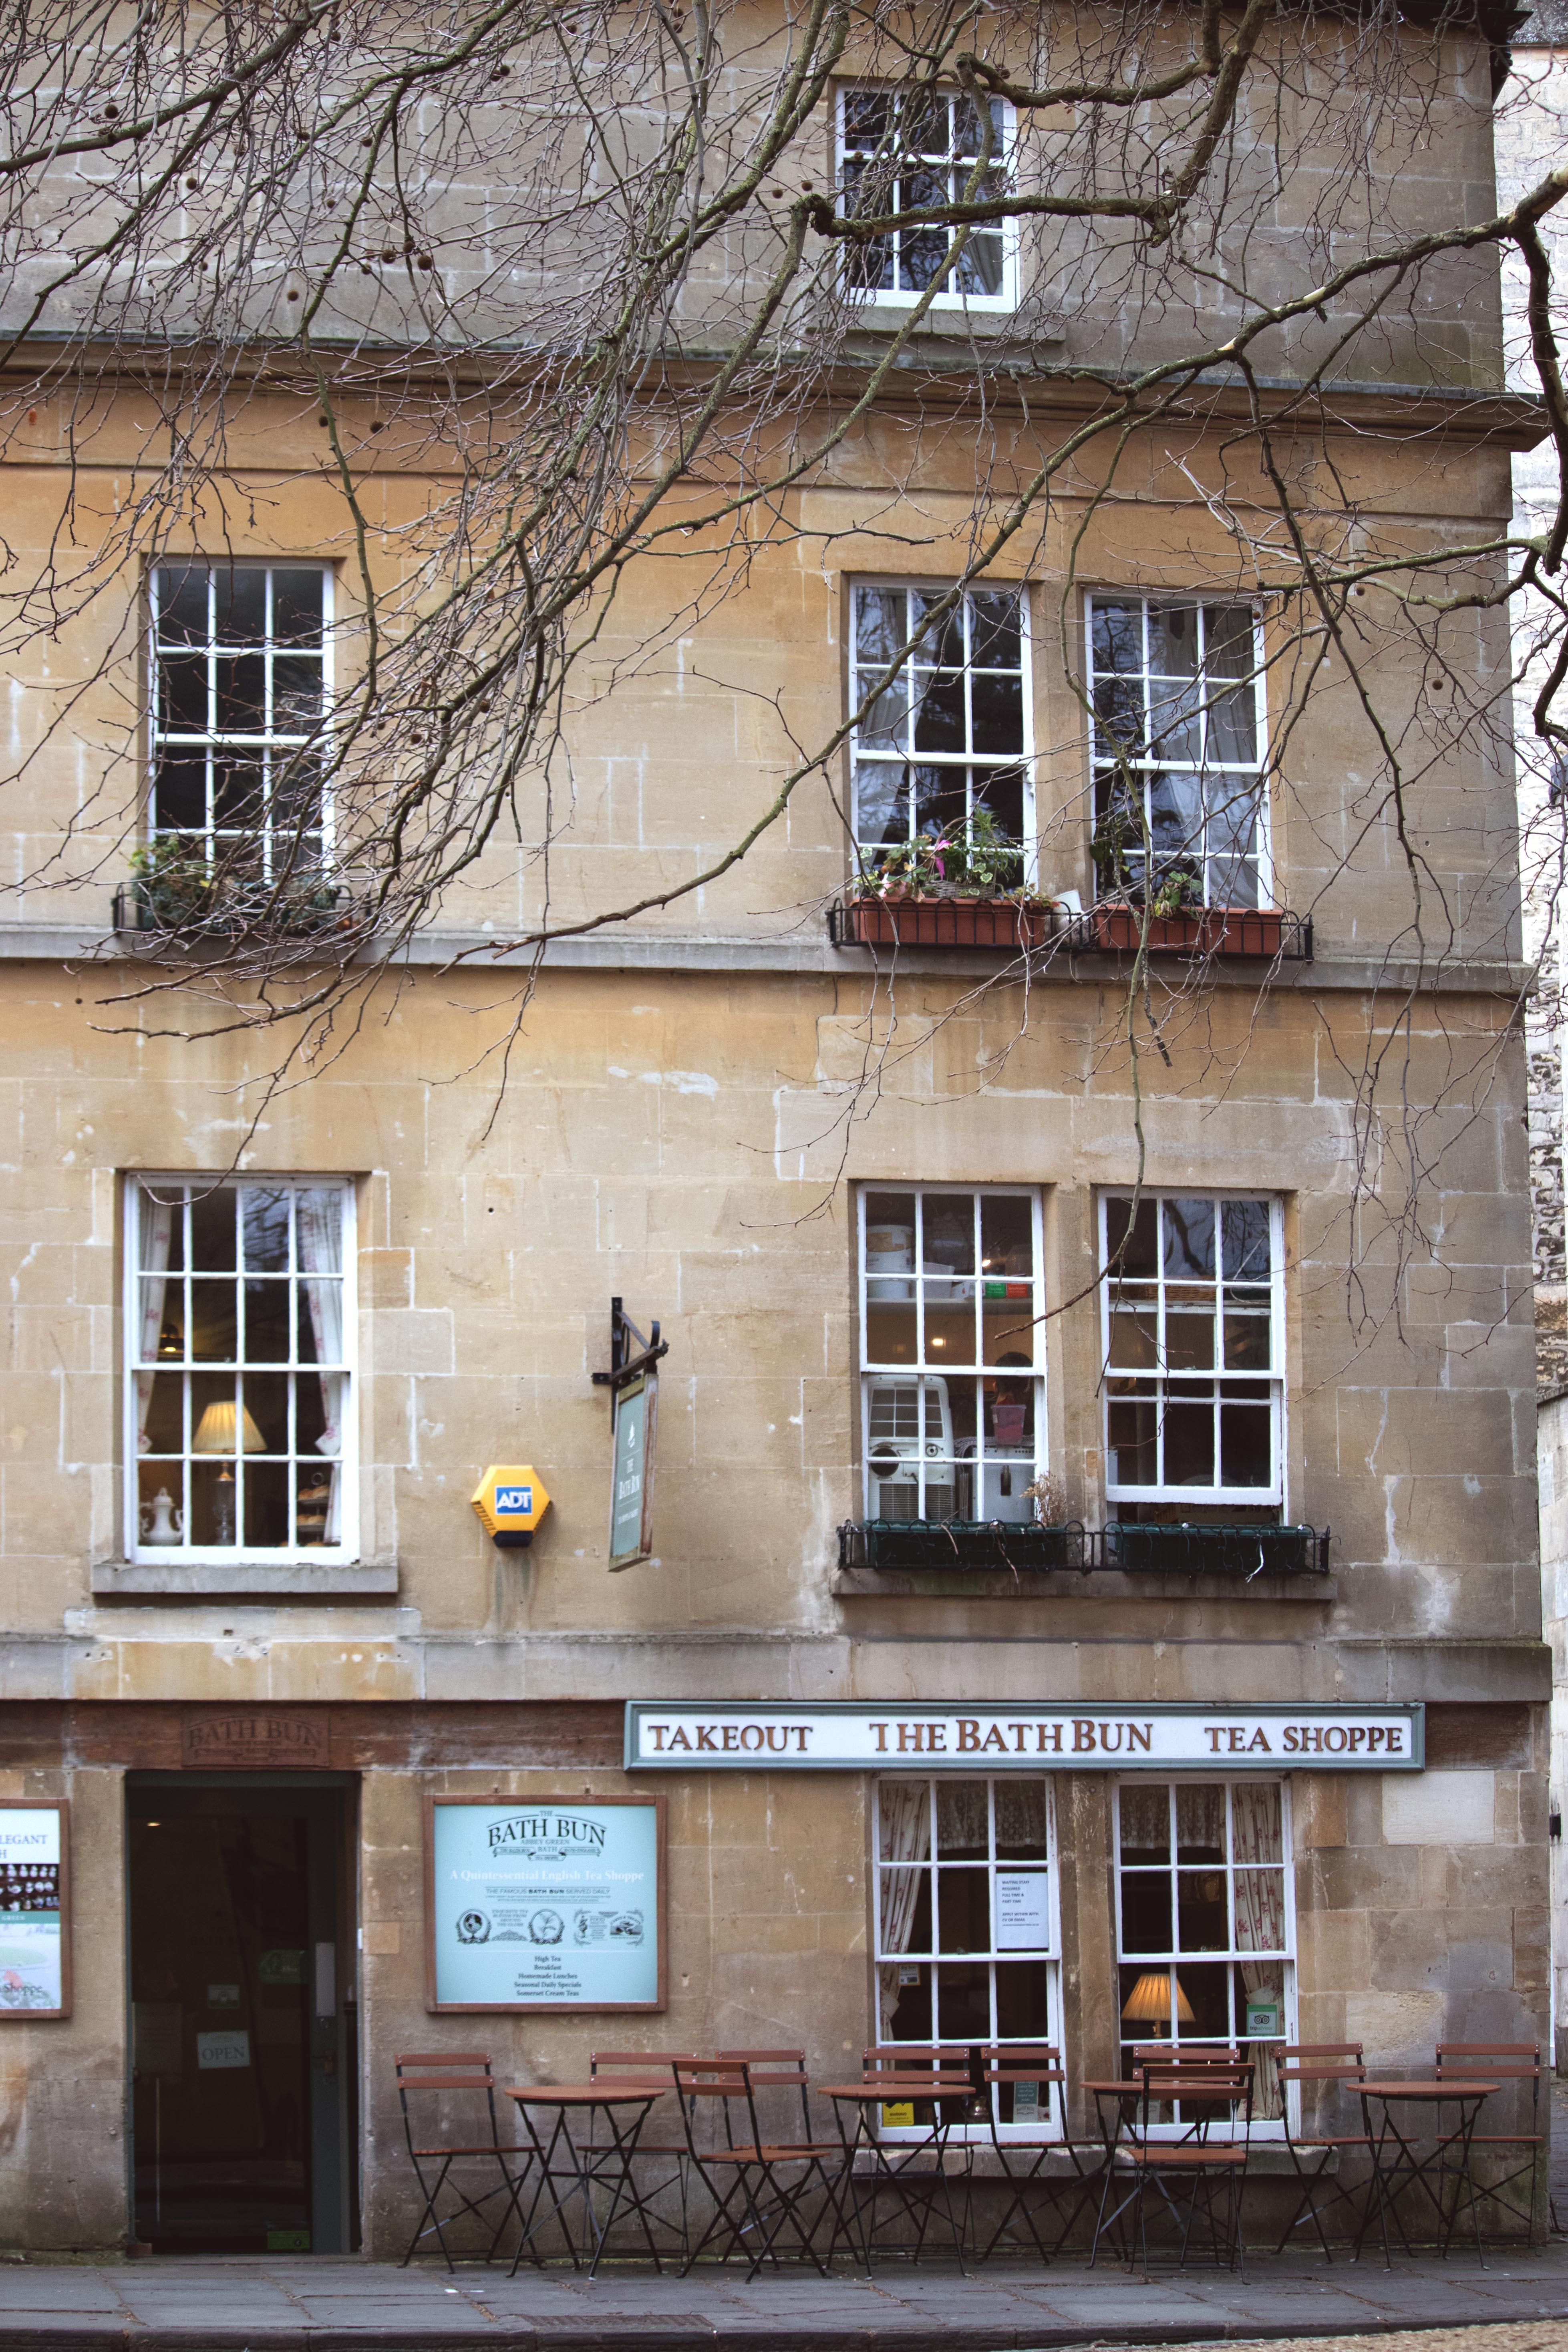 Winter Streets of Bath